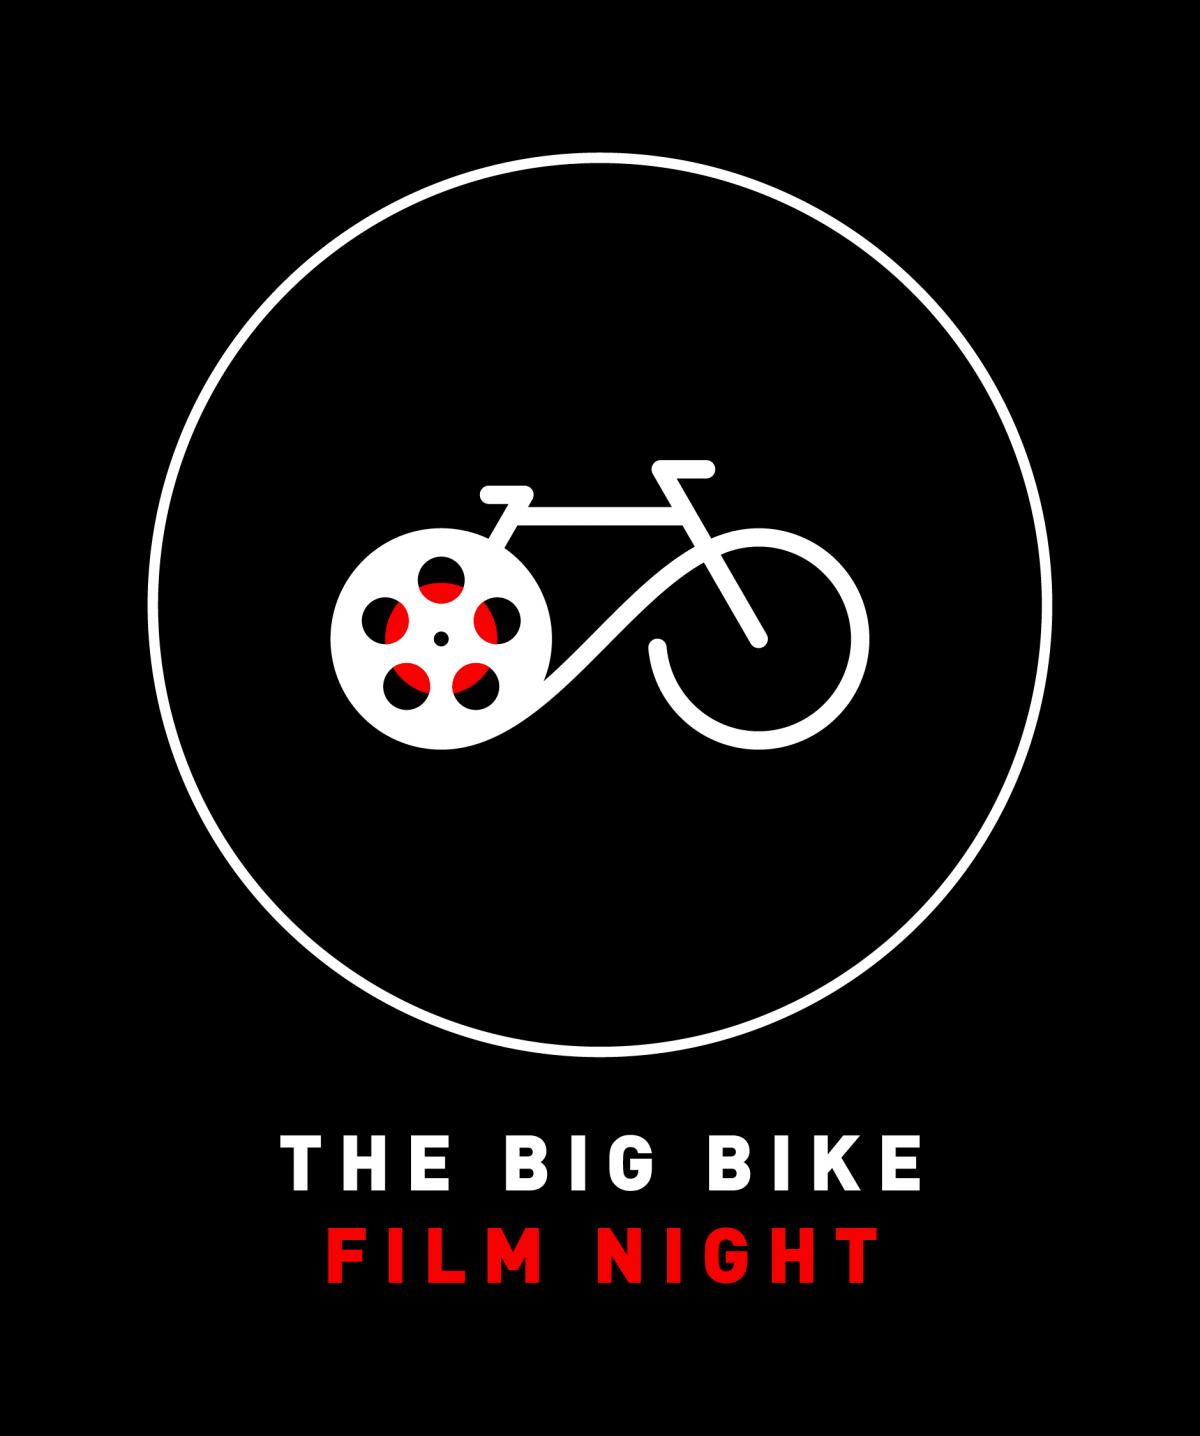 The Big Bike Film Night - Canberra